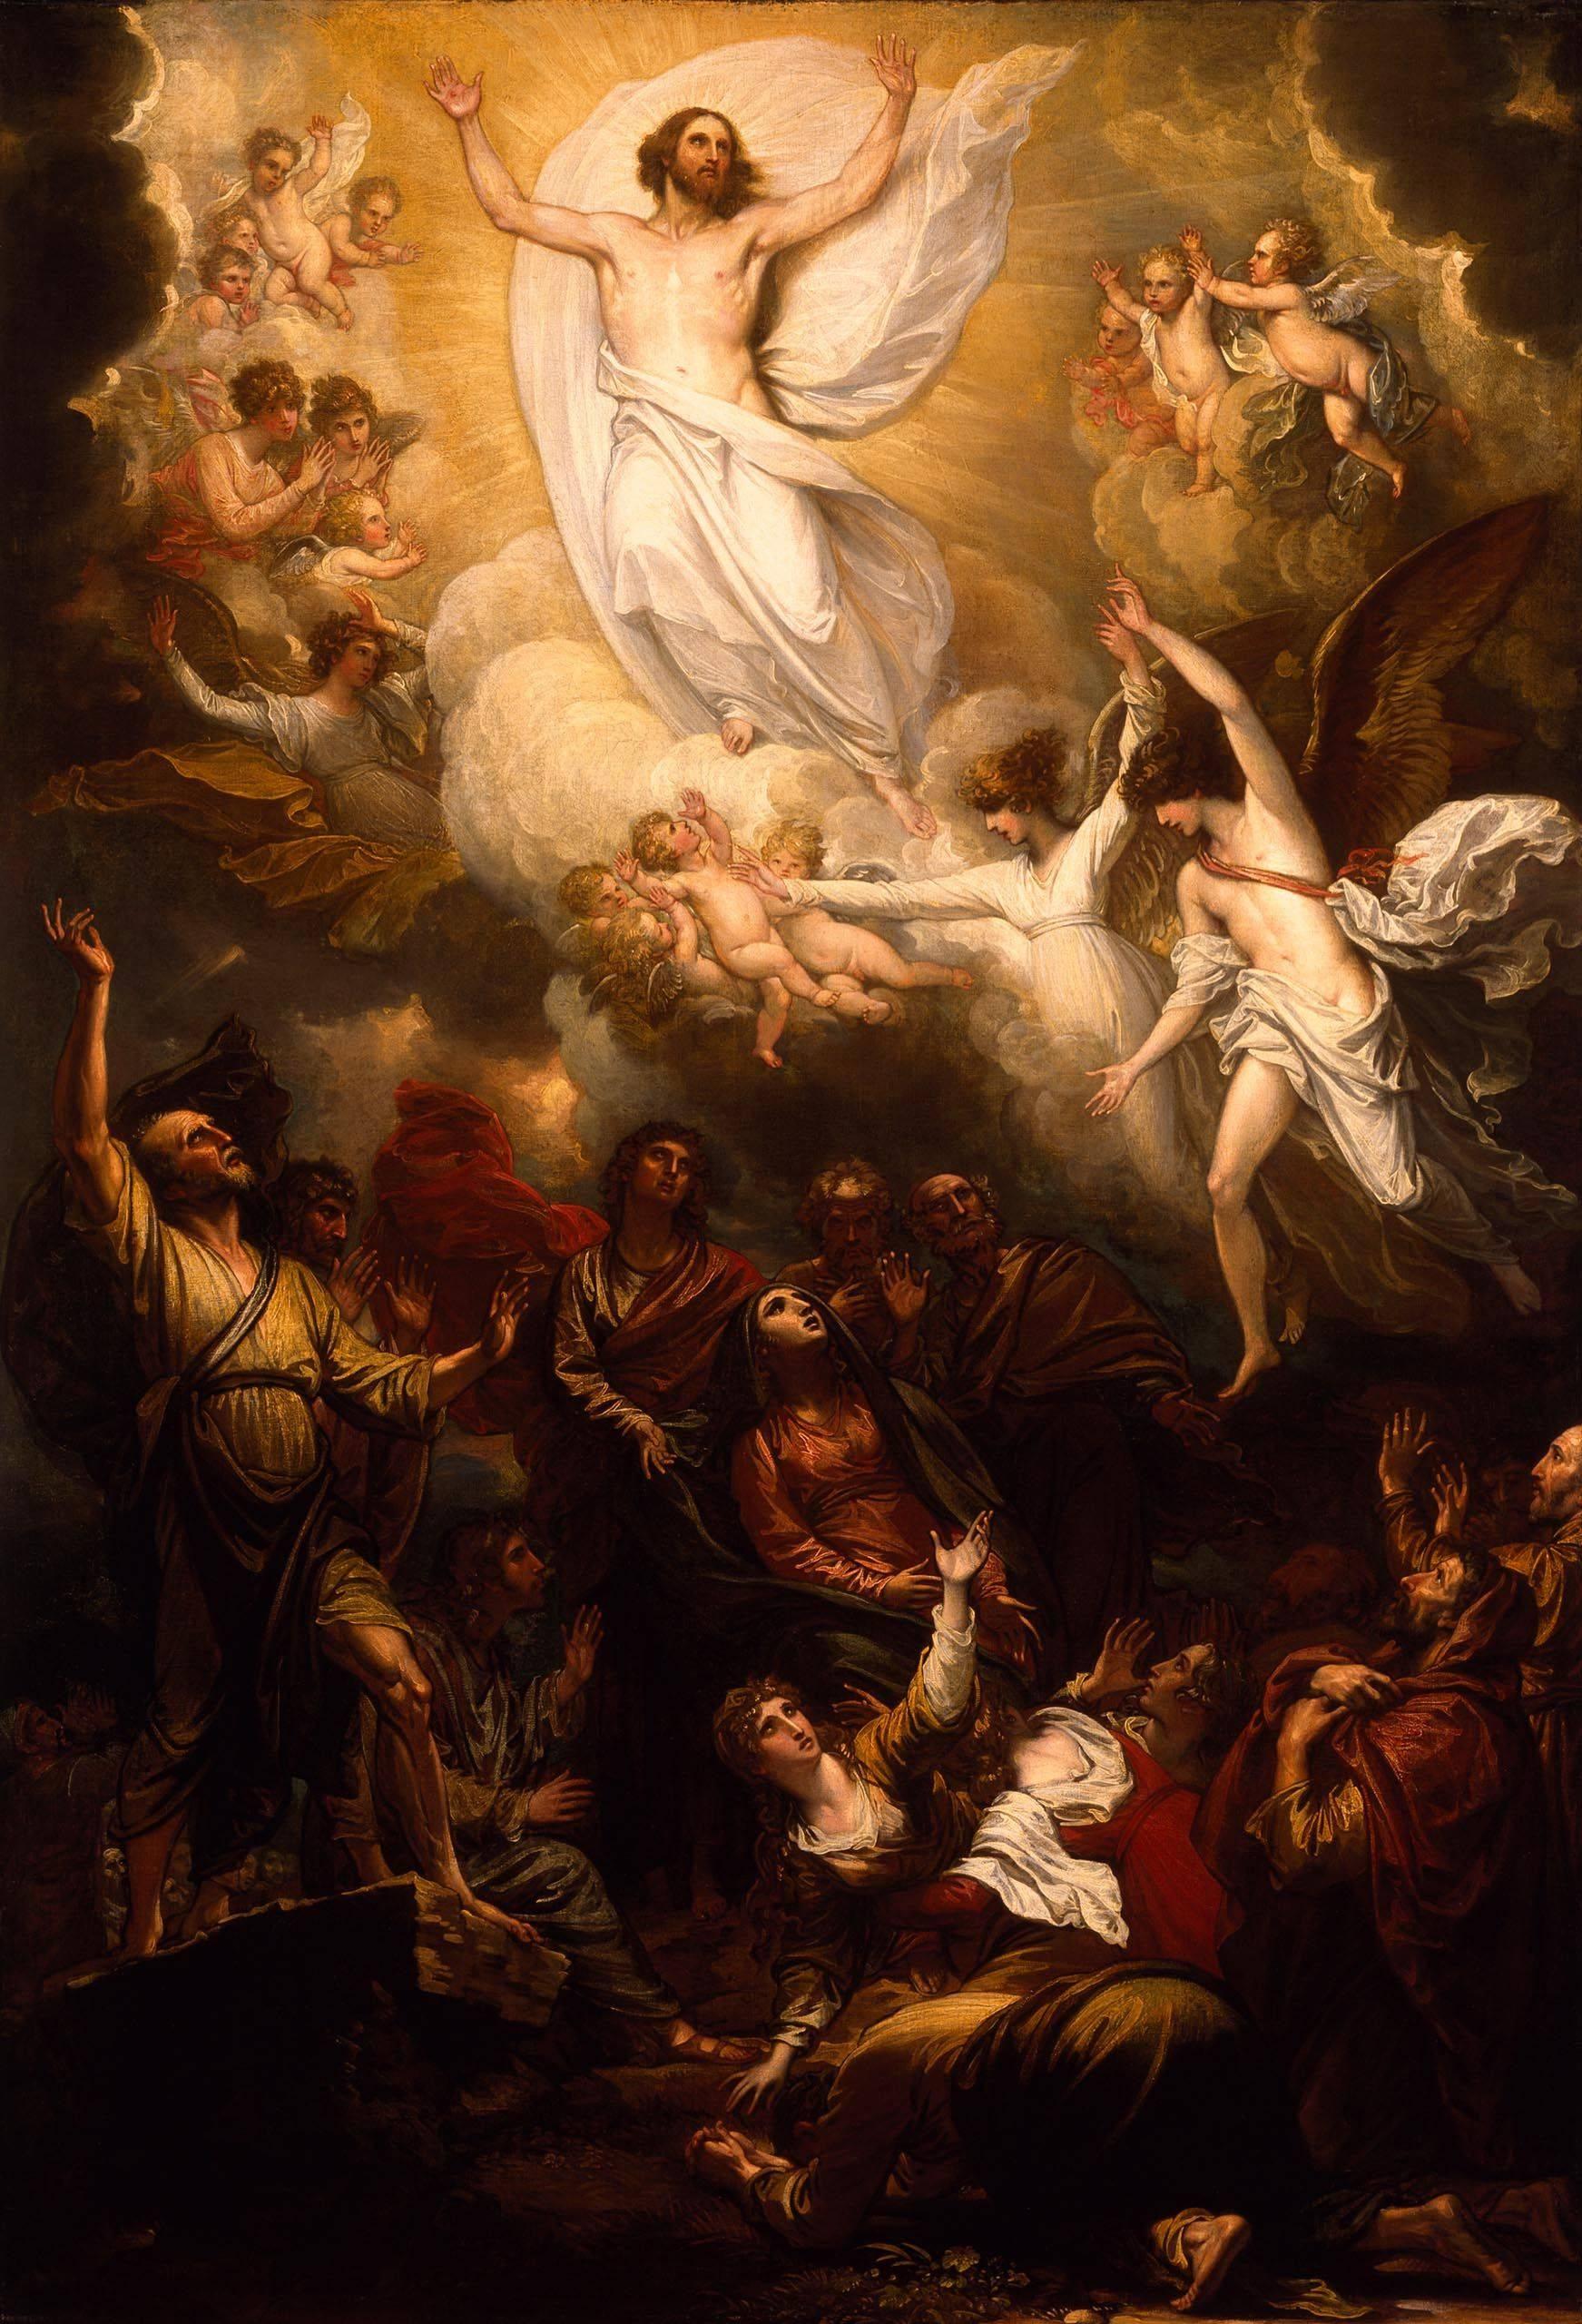 Jesus Wallpapers Images HD art